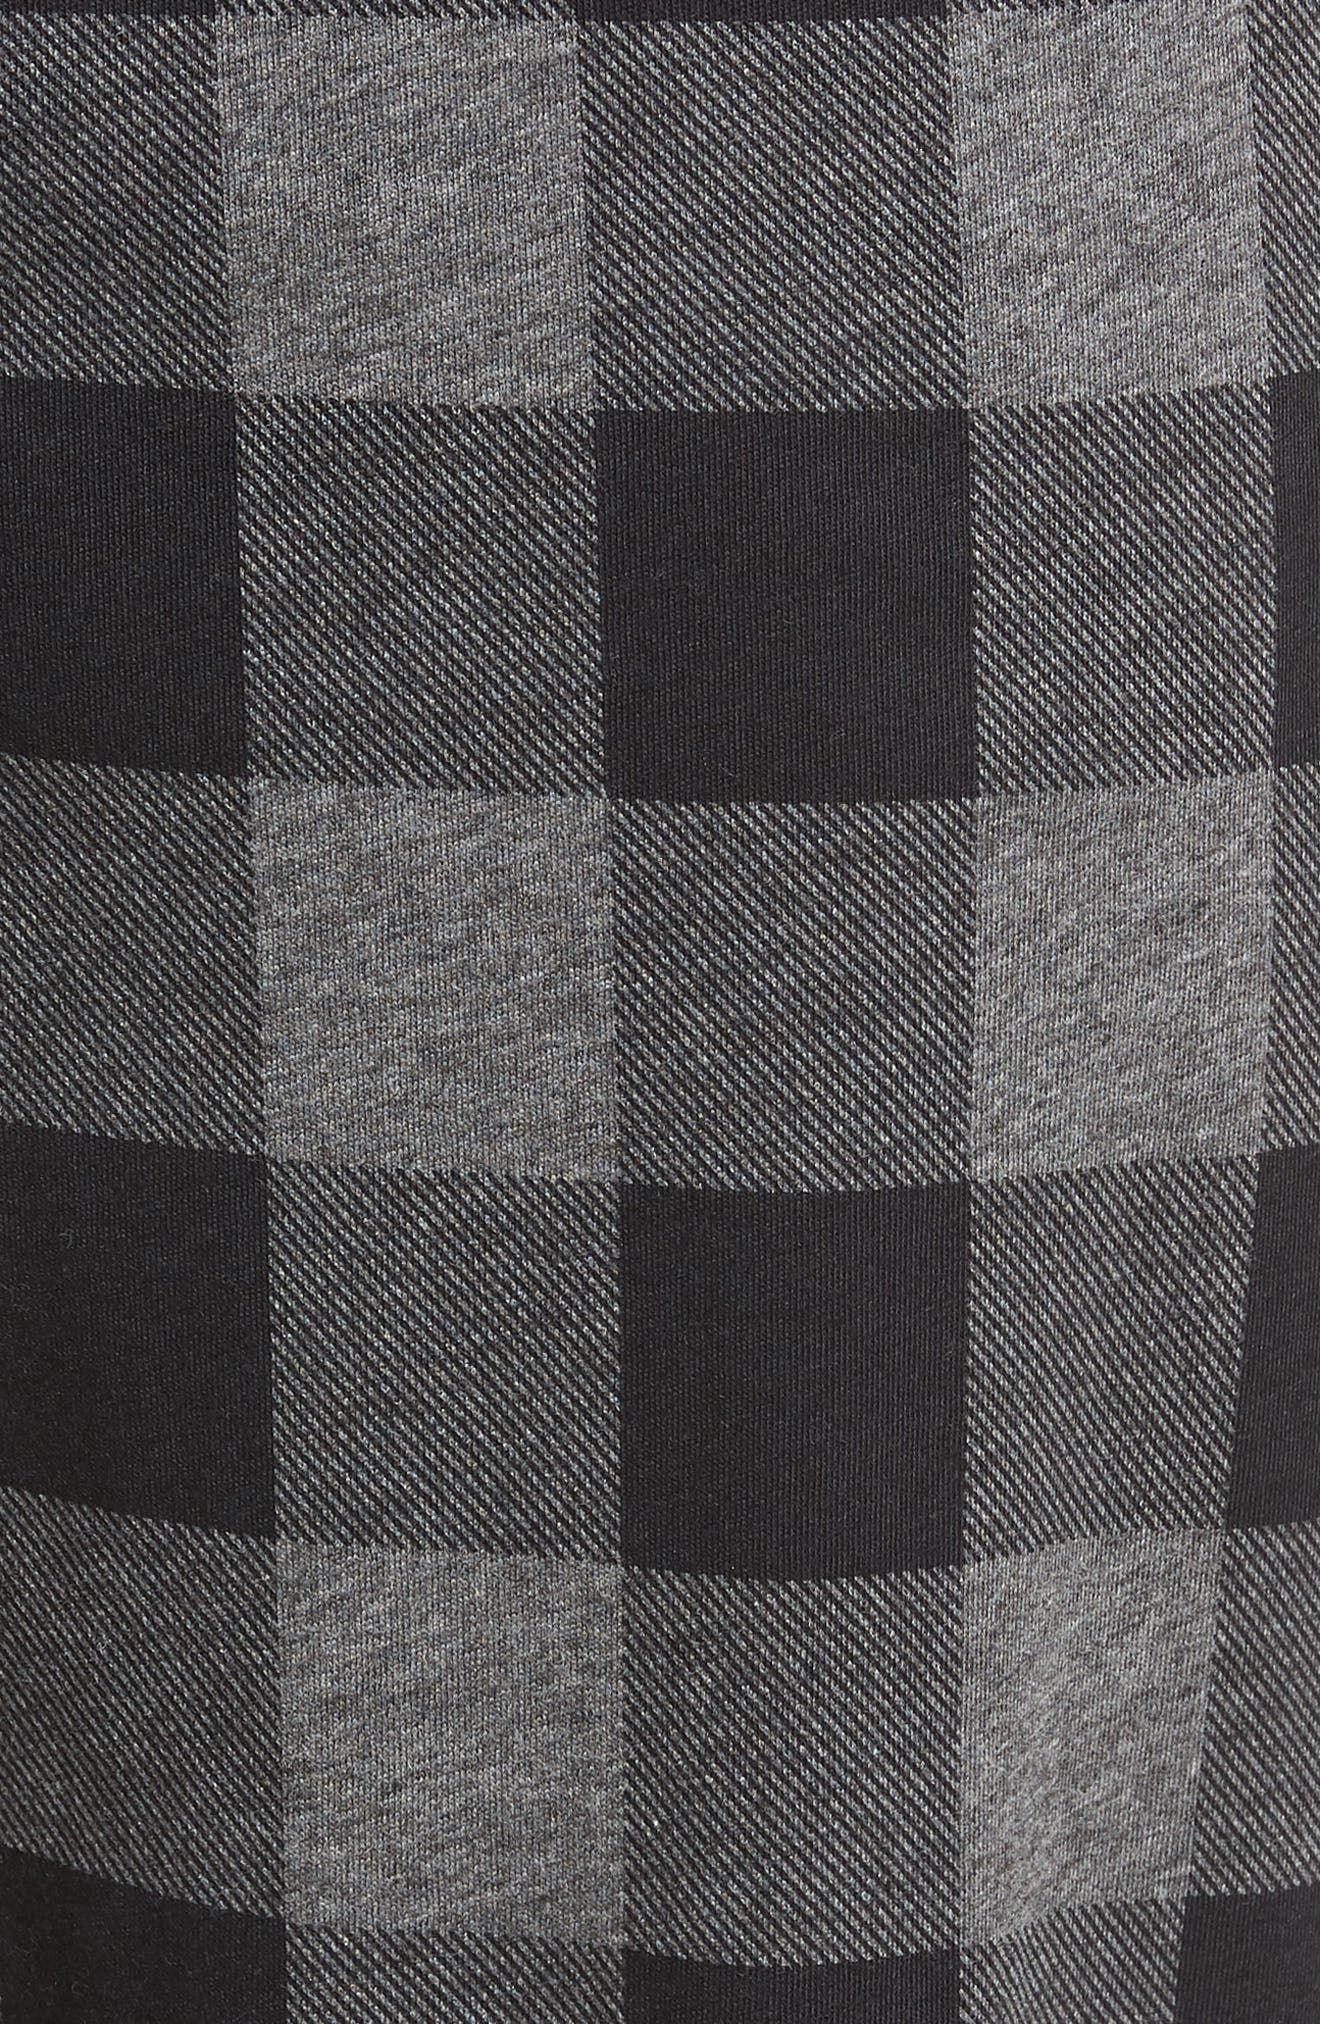 Cotton Lounge Pants,                             Alternate thumbnail 5, color,                             CHARCOAL/ BUFFALO PLAID